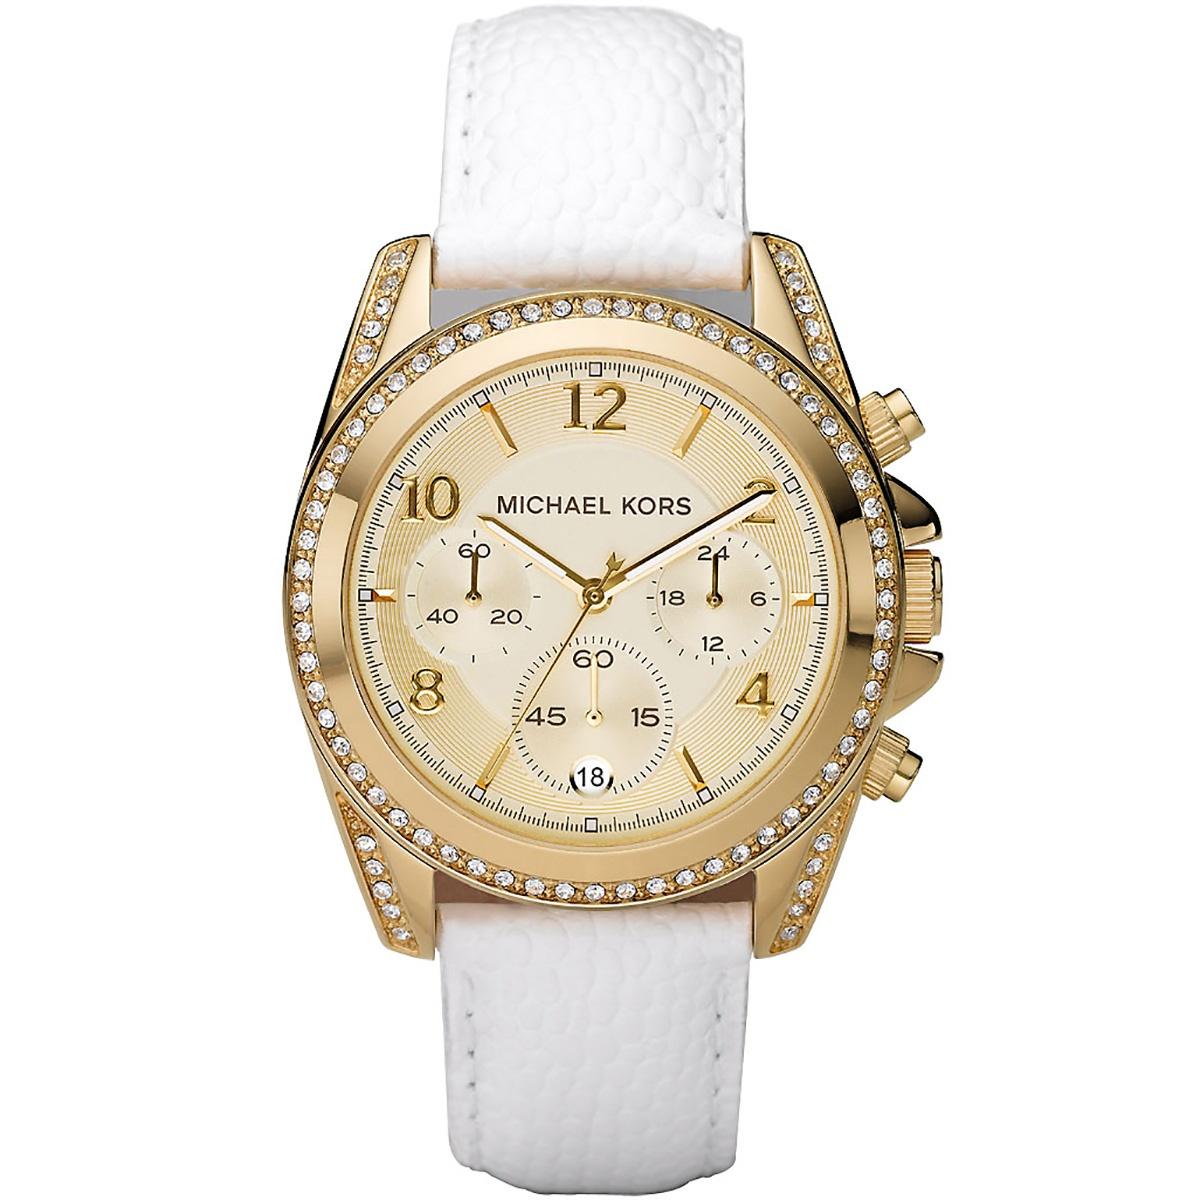 Details zu Michael Kors Uhr MK5460 Damenuhr Gold Weiß Strass Leder Chronograph NEU & OVP